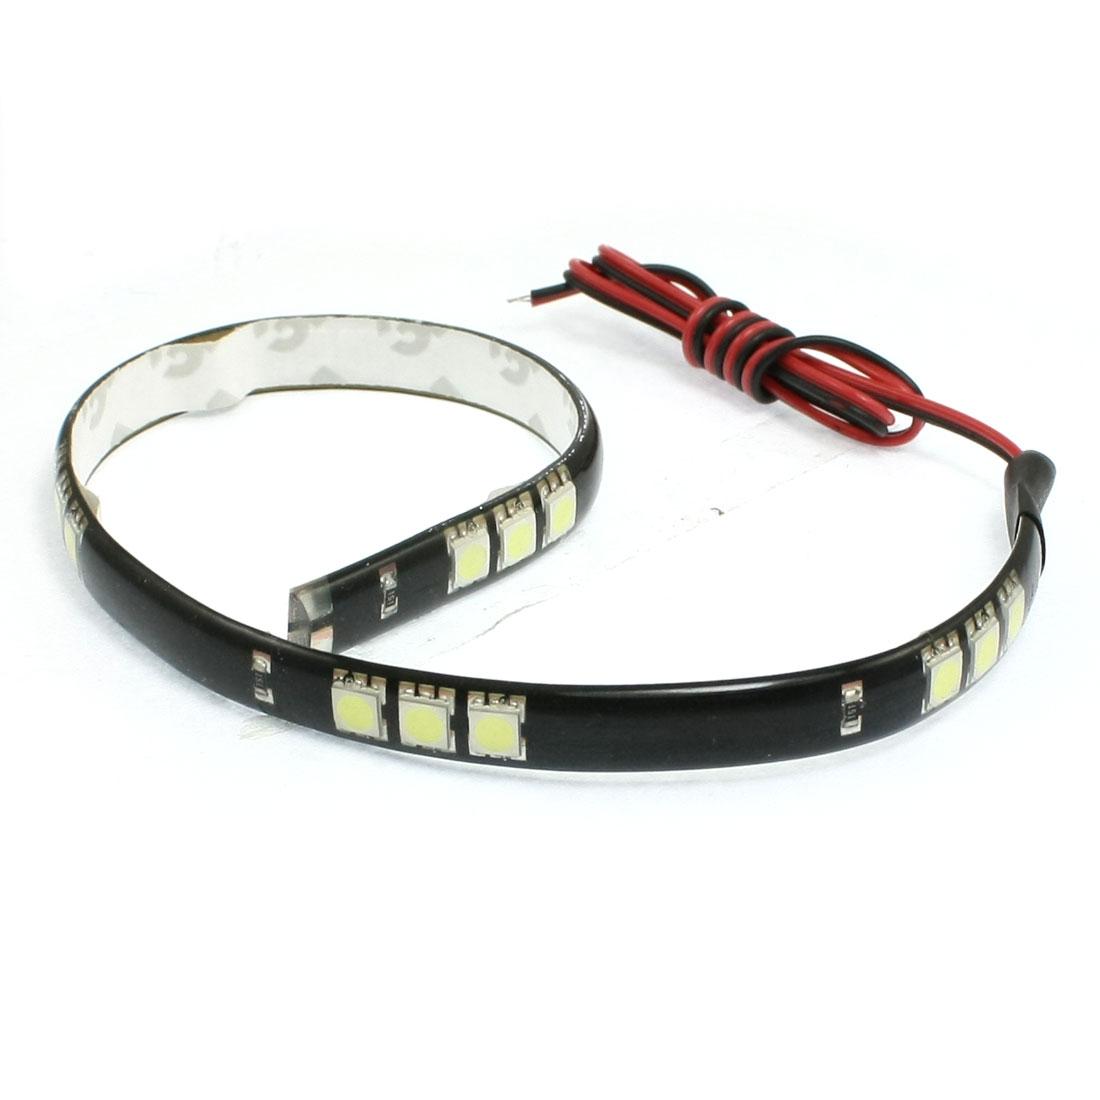 Car Auto DC 12V White 5050 SMD 15-LED Strip Light Lamp 30cm